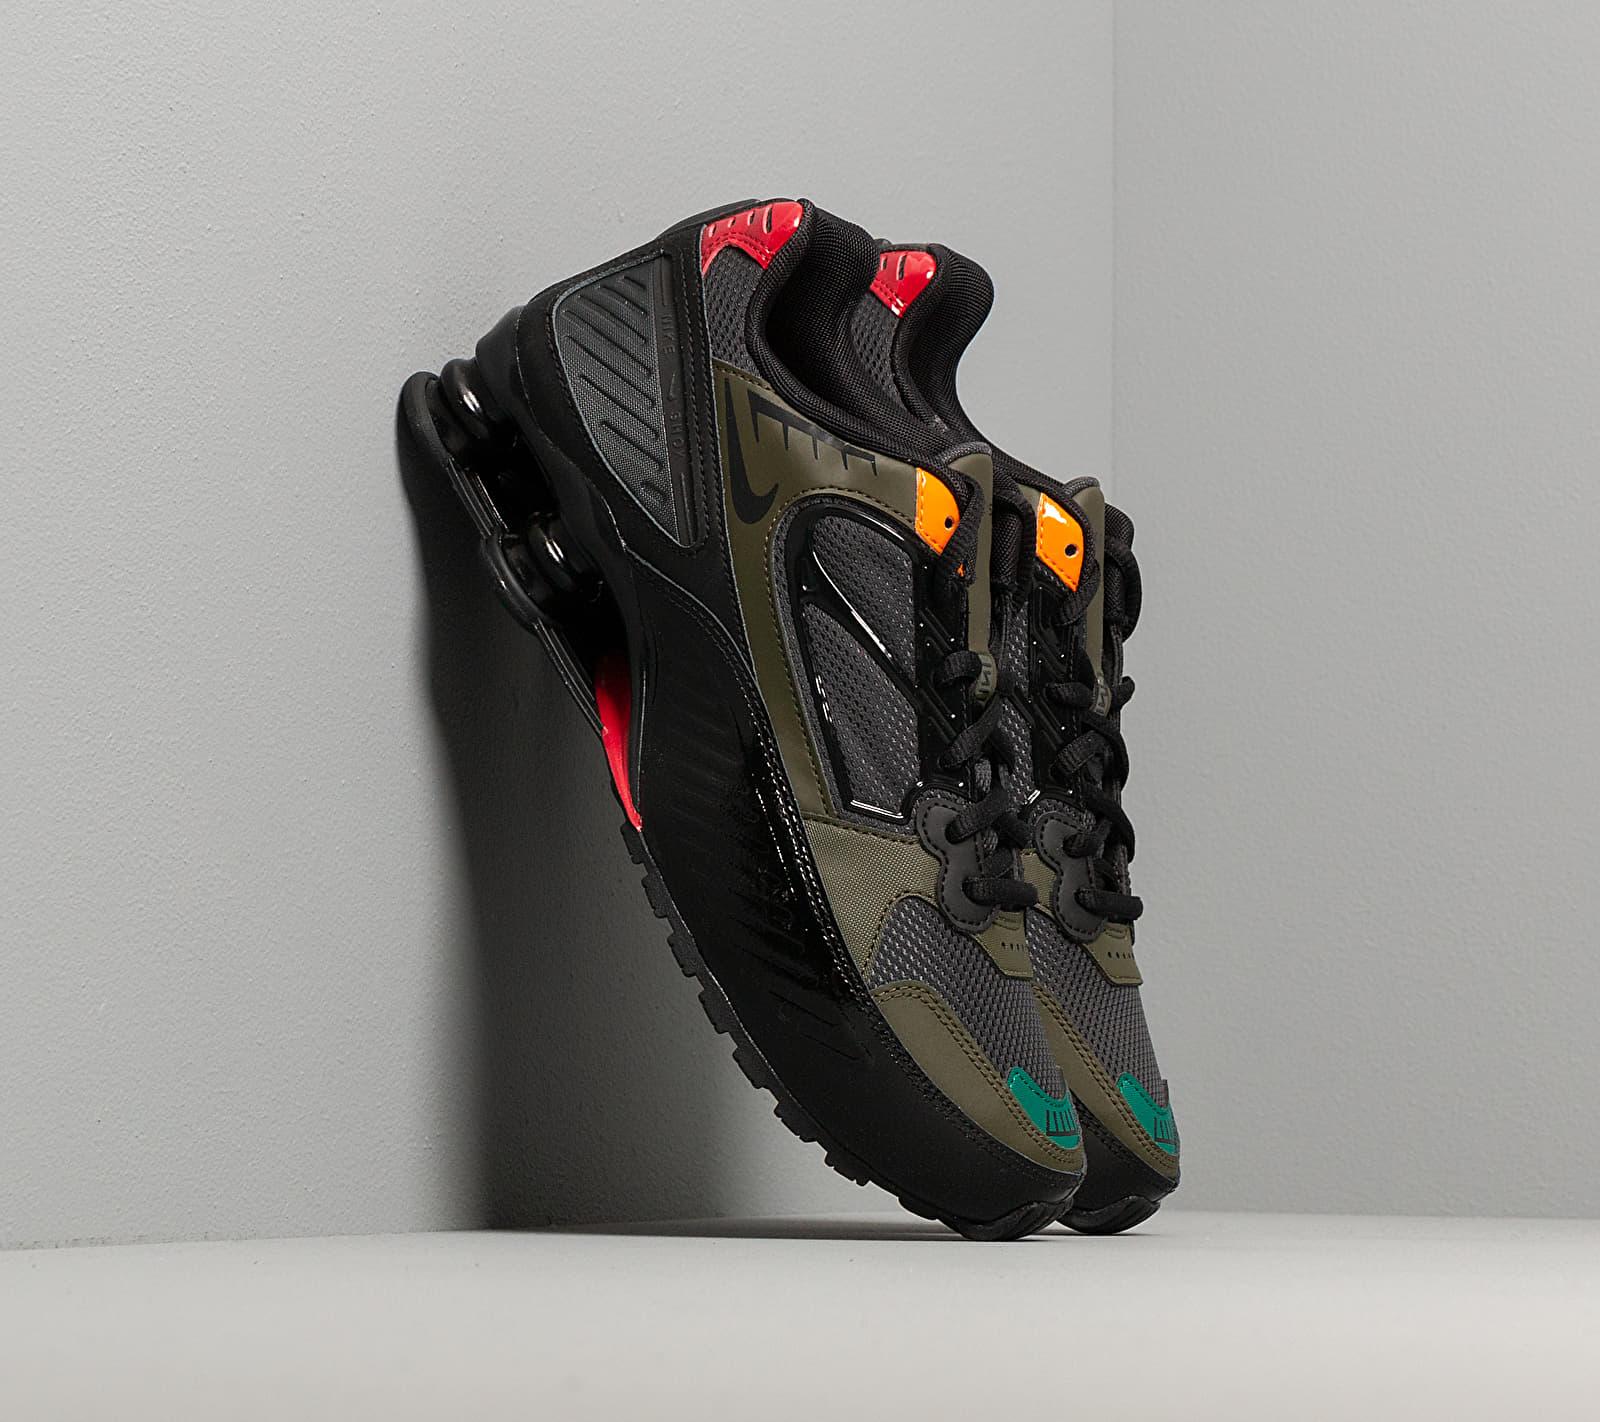 Nike W Shox Enigma Black/ Anthracite-Cargo Khaki-Gym Red